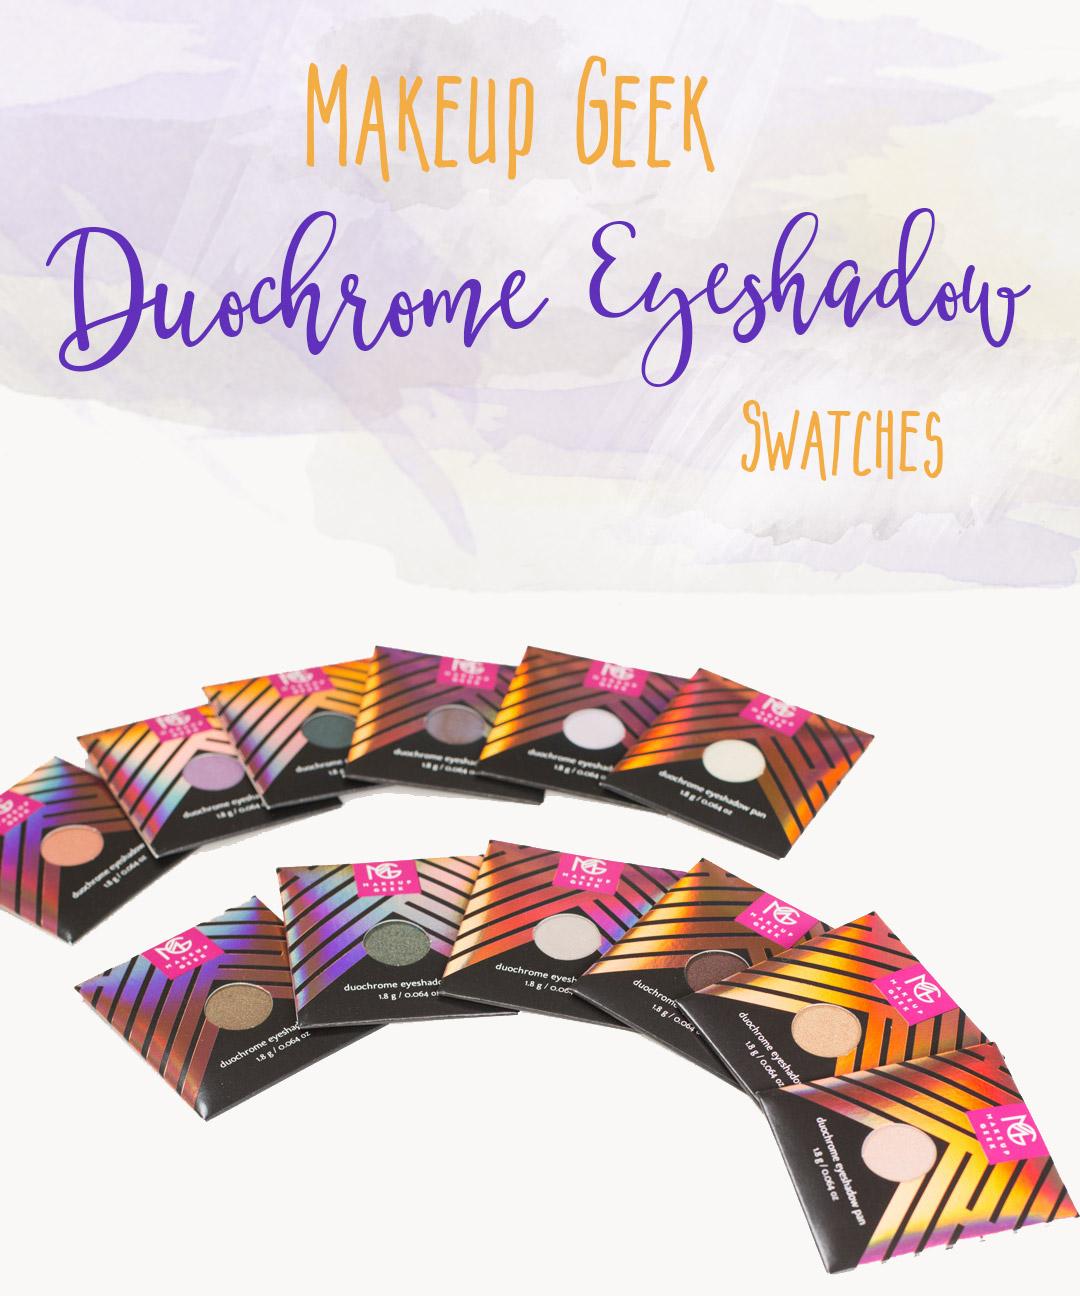 Makeup Geek Duochrome Eyeshadow Swatches